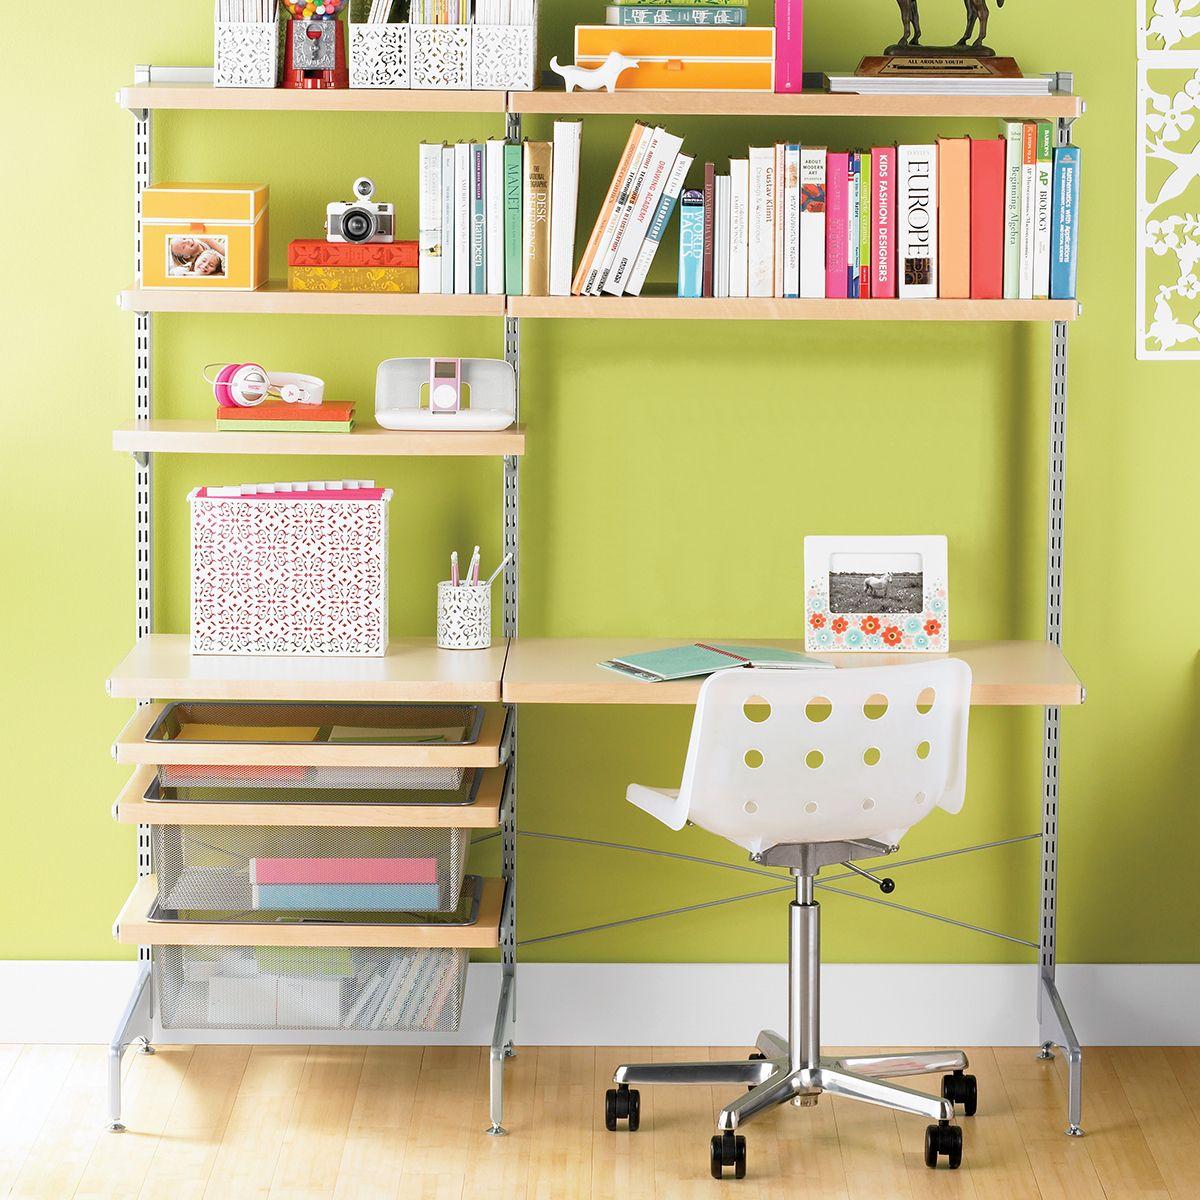 Elfa Decor Freestanding Study Zone In 2020 Container Store Elfa Shelving Elfa